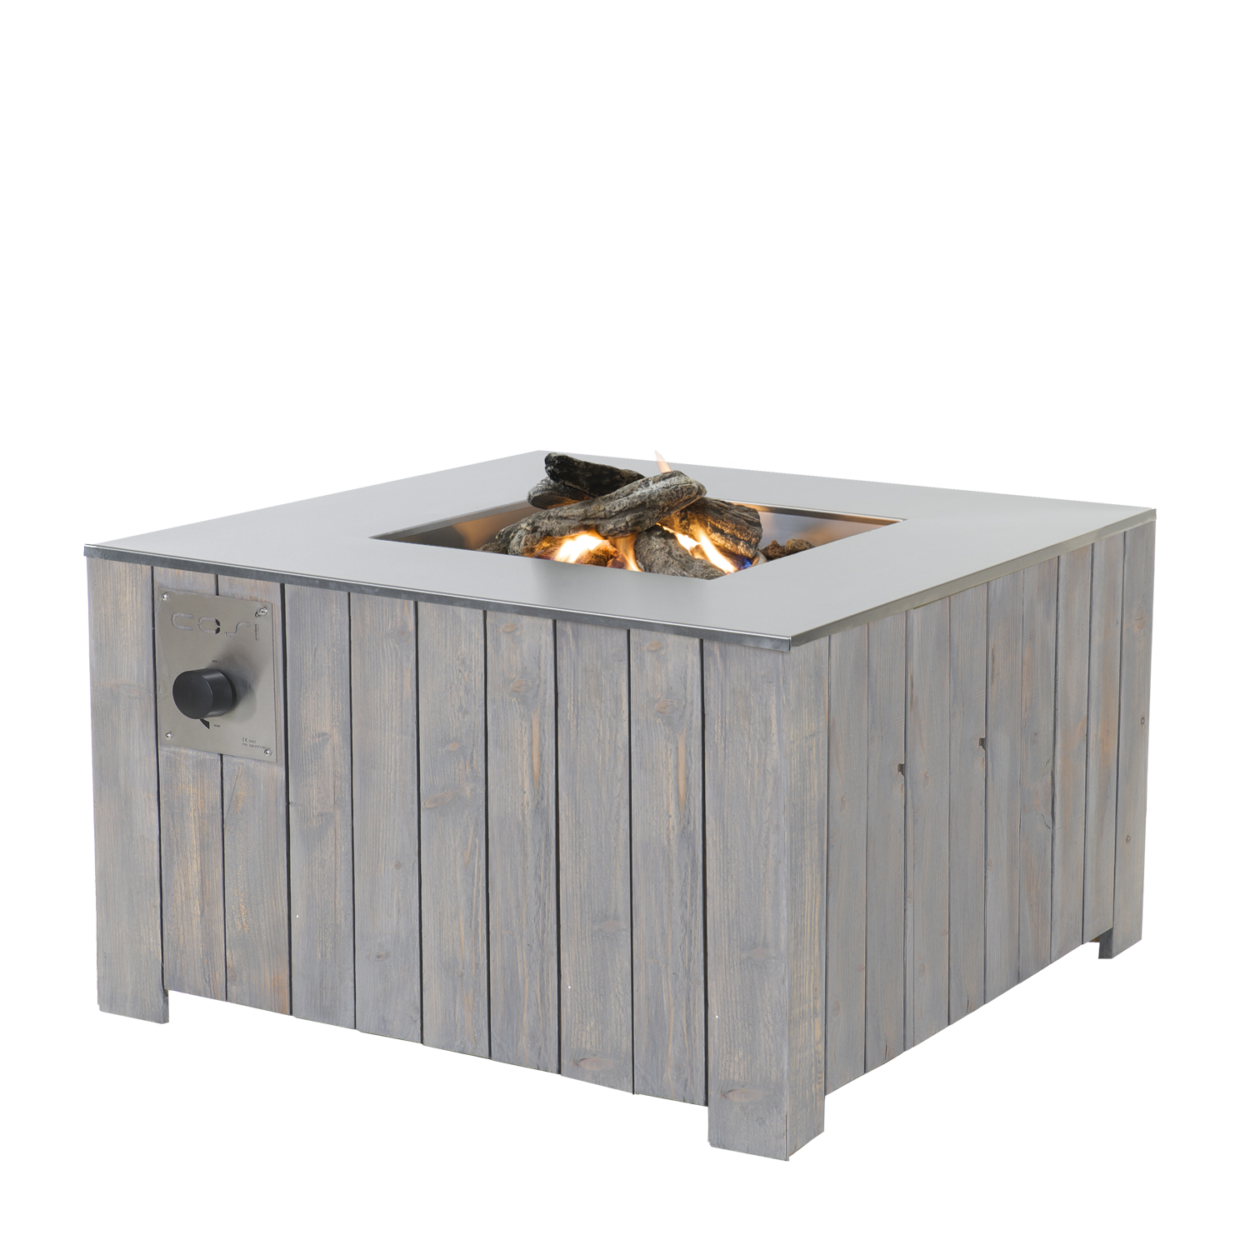 Cosi Fires Cosicube 95 Buitenhaard Grey Wash